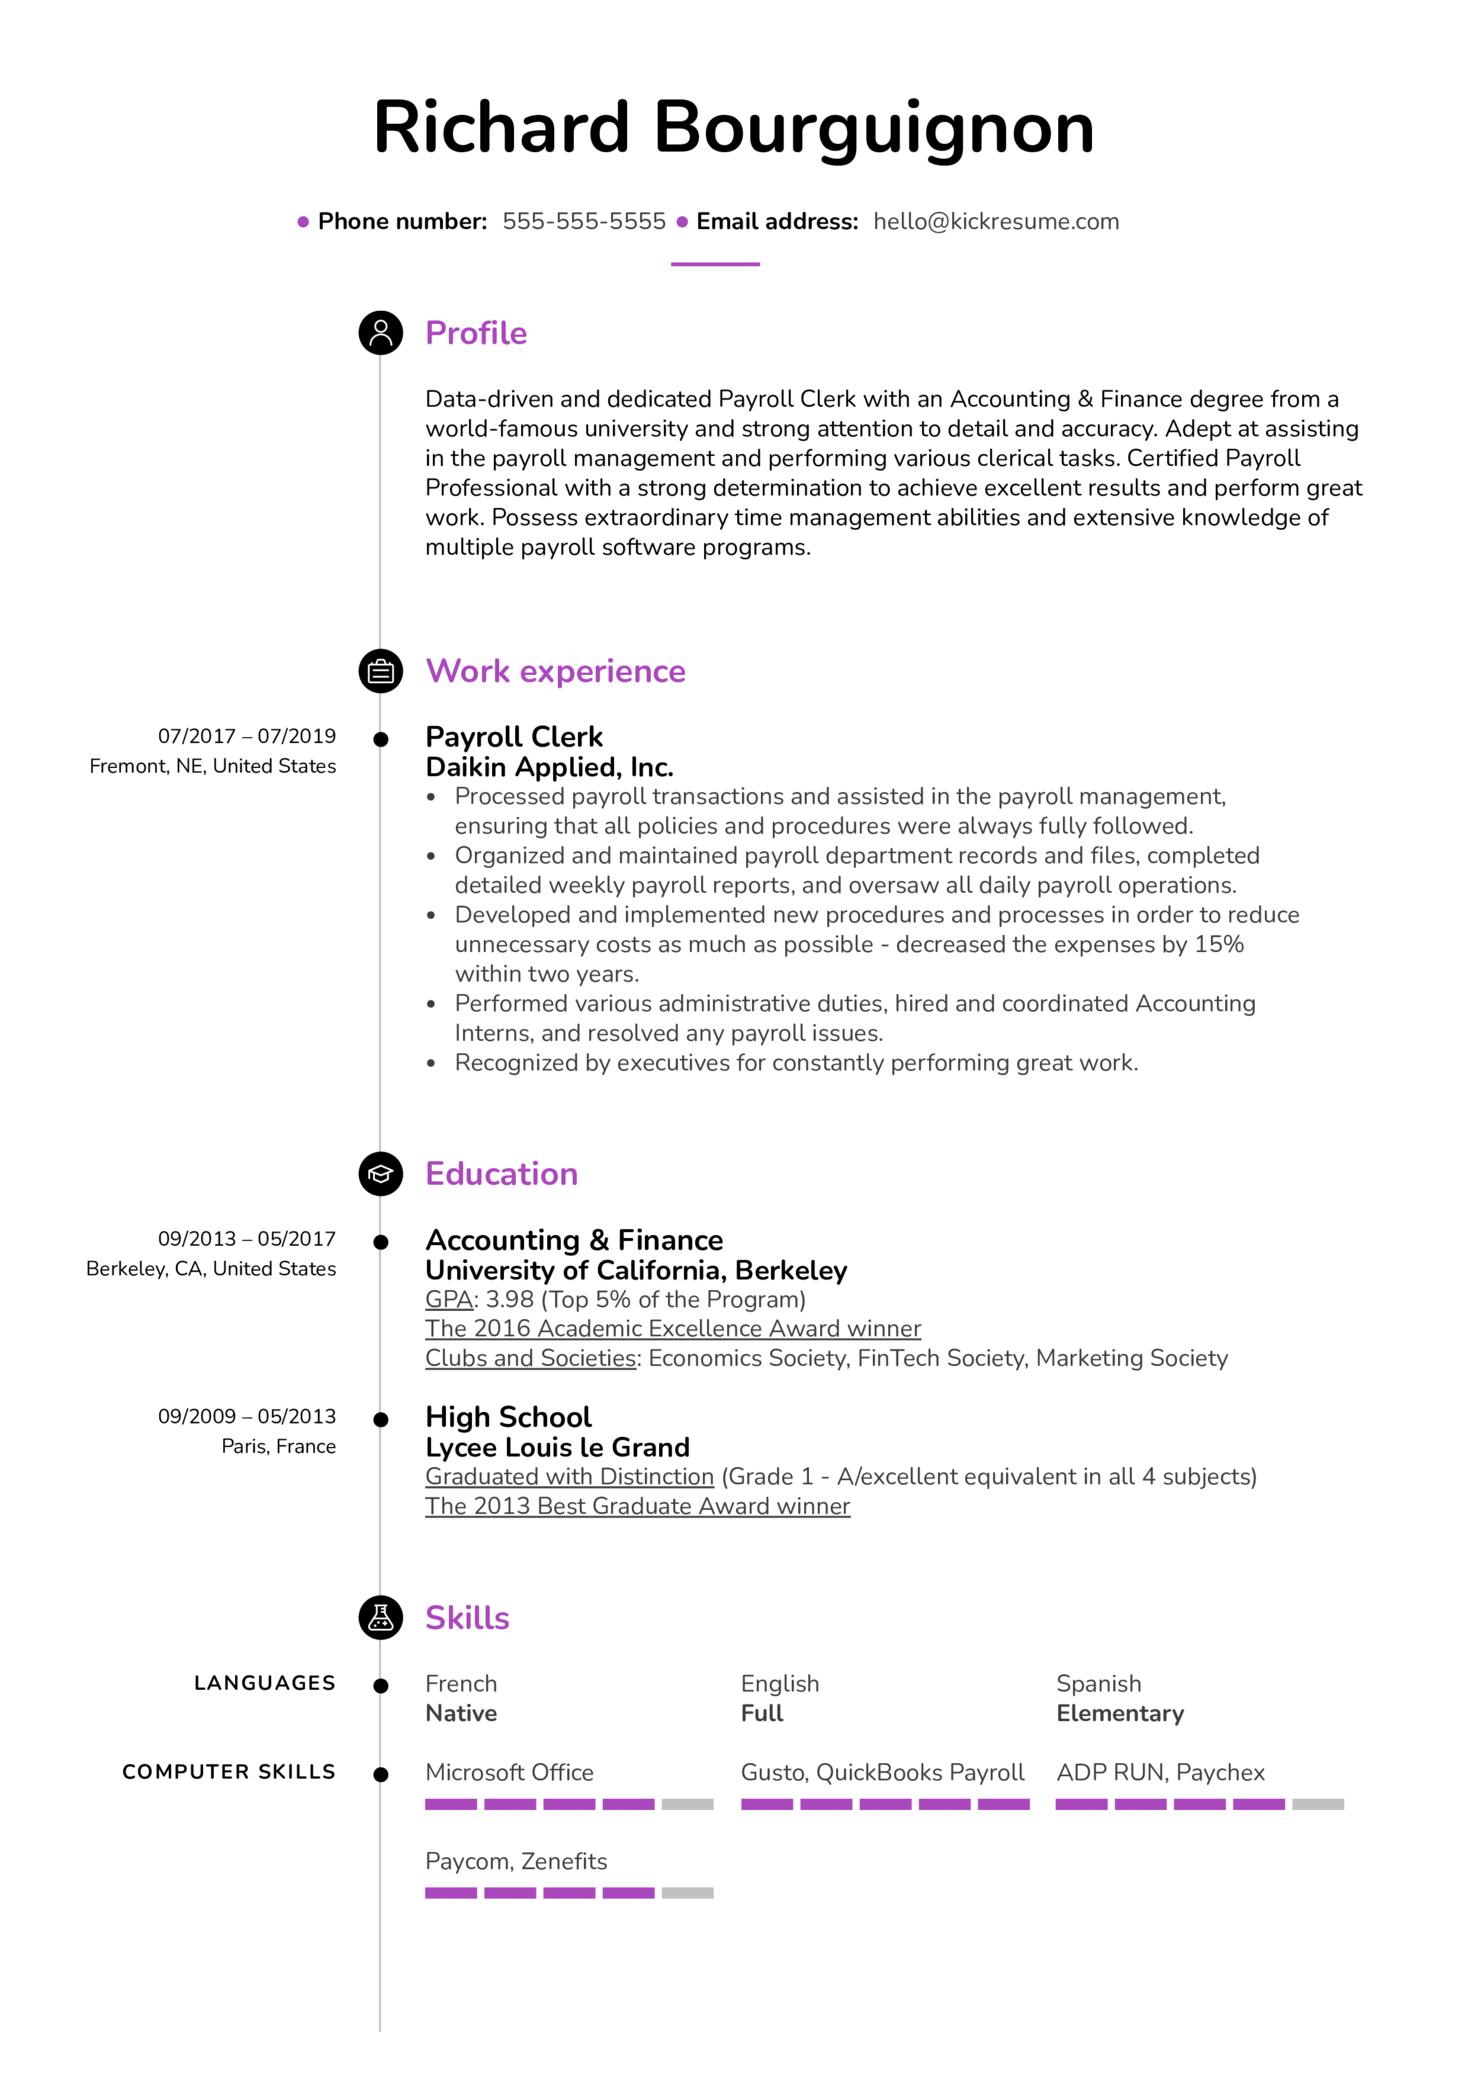 Payroll Clerk Resume Example (Part 1)